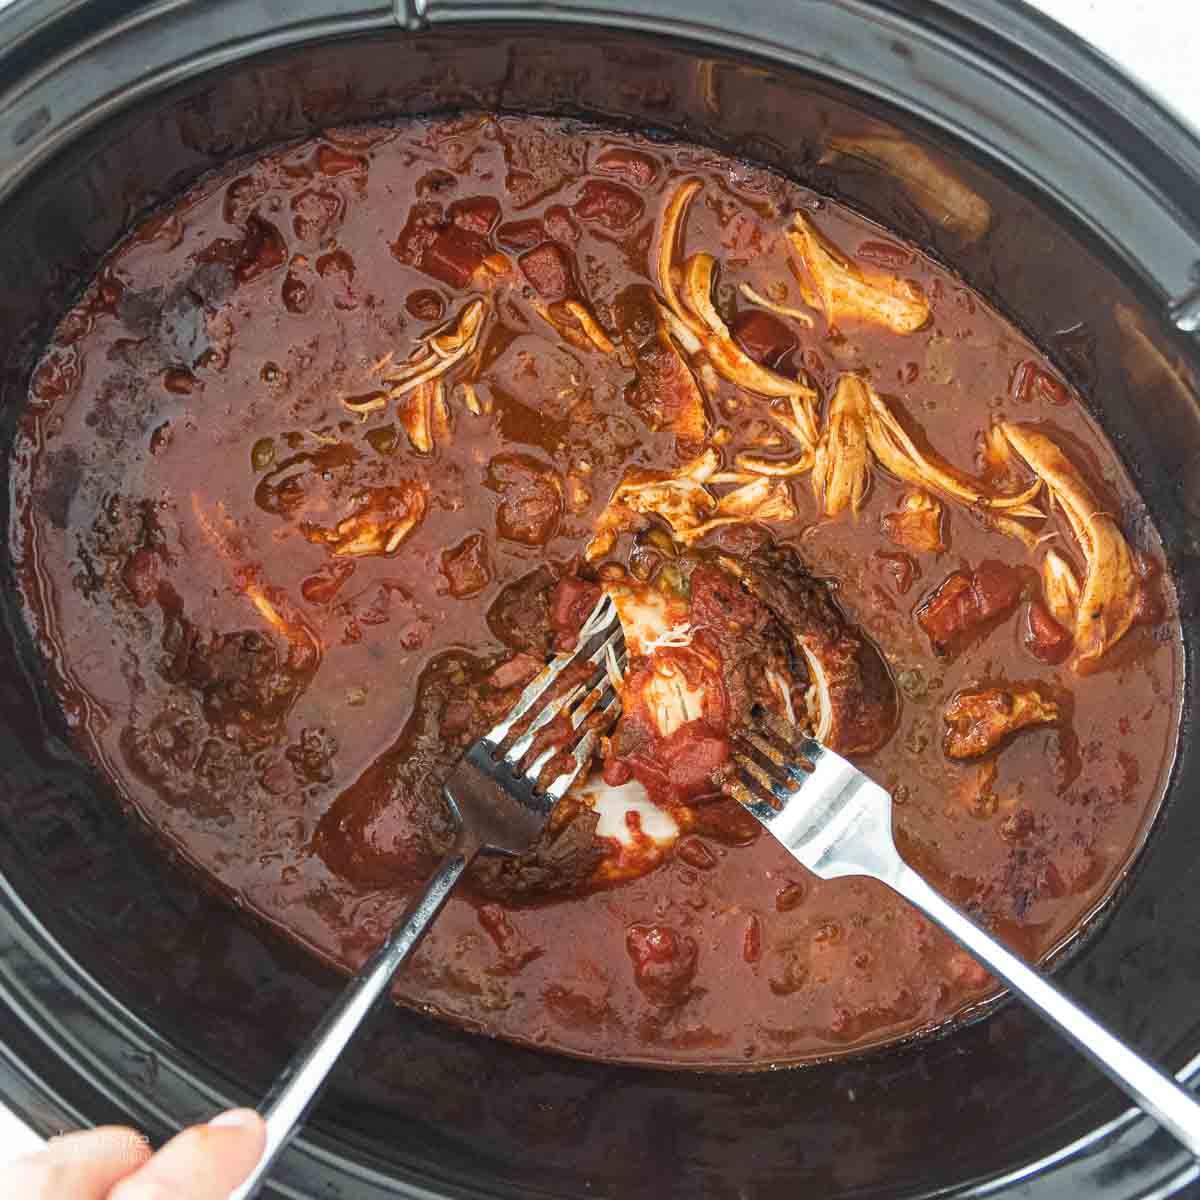 forks shredding chicken in crockpot